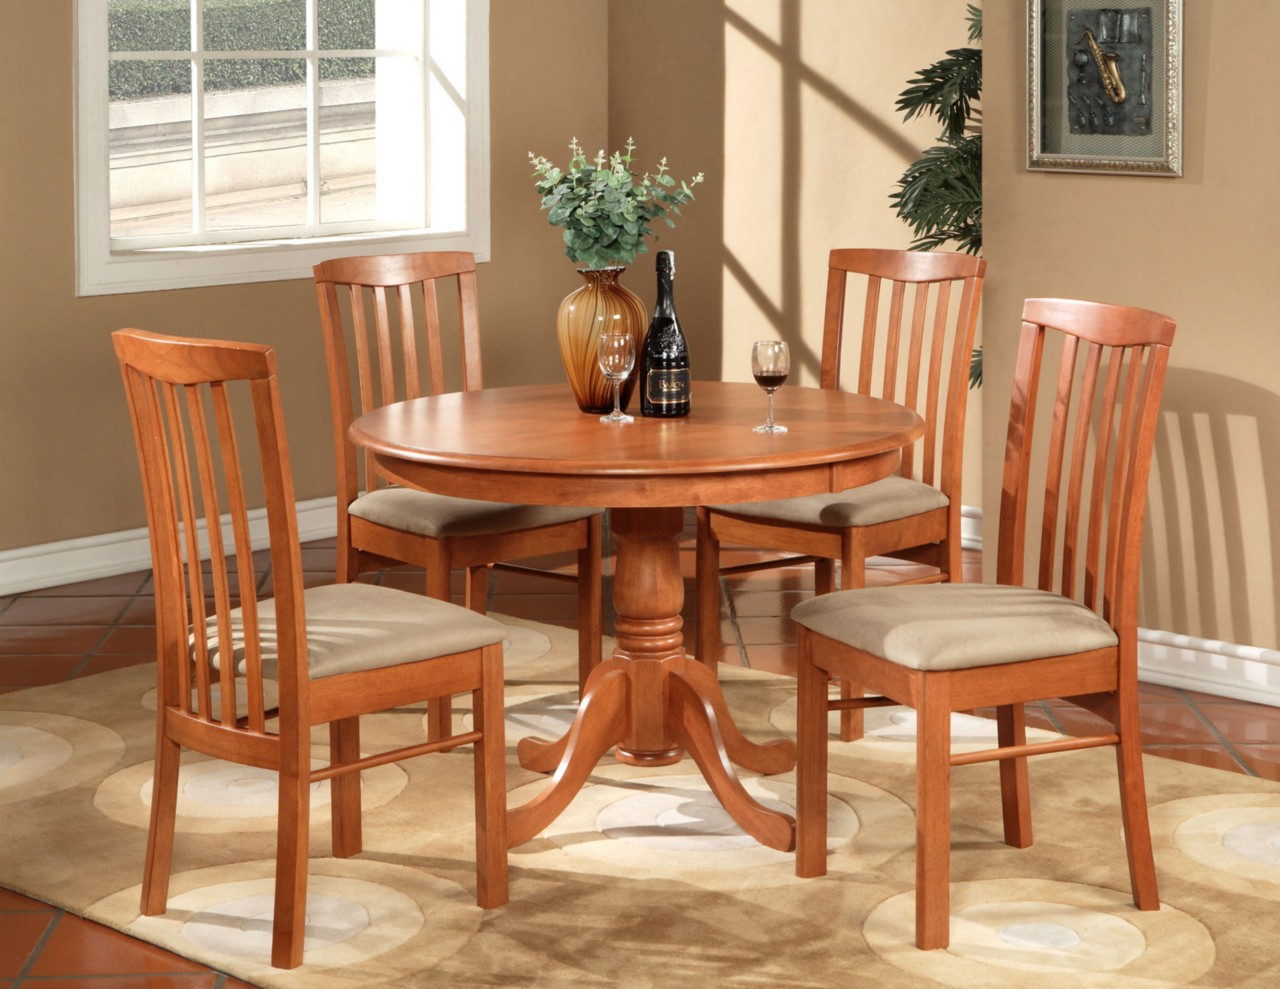 Round kitchen table sets Photo - 4